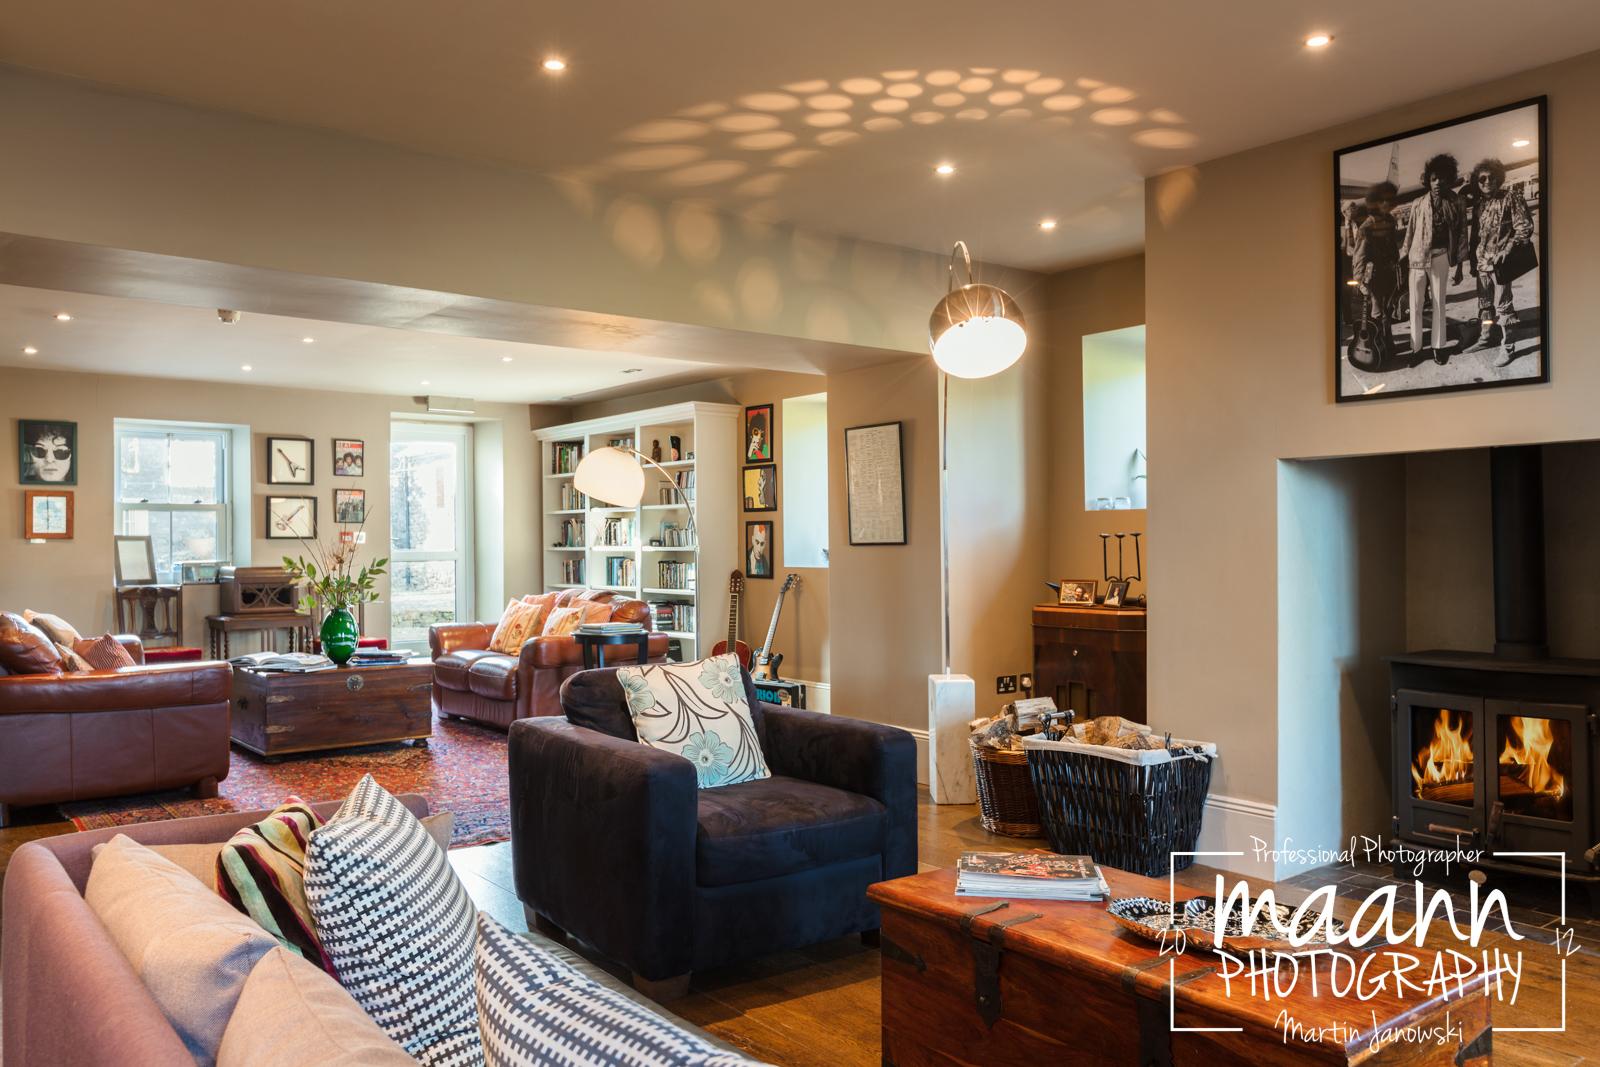 interior photography photography studio